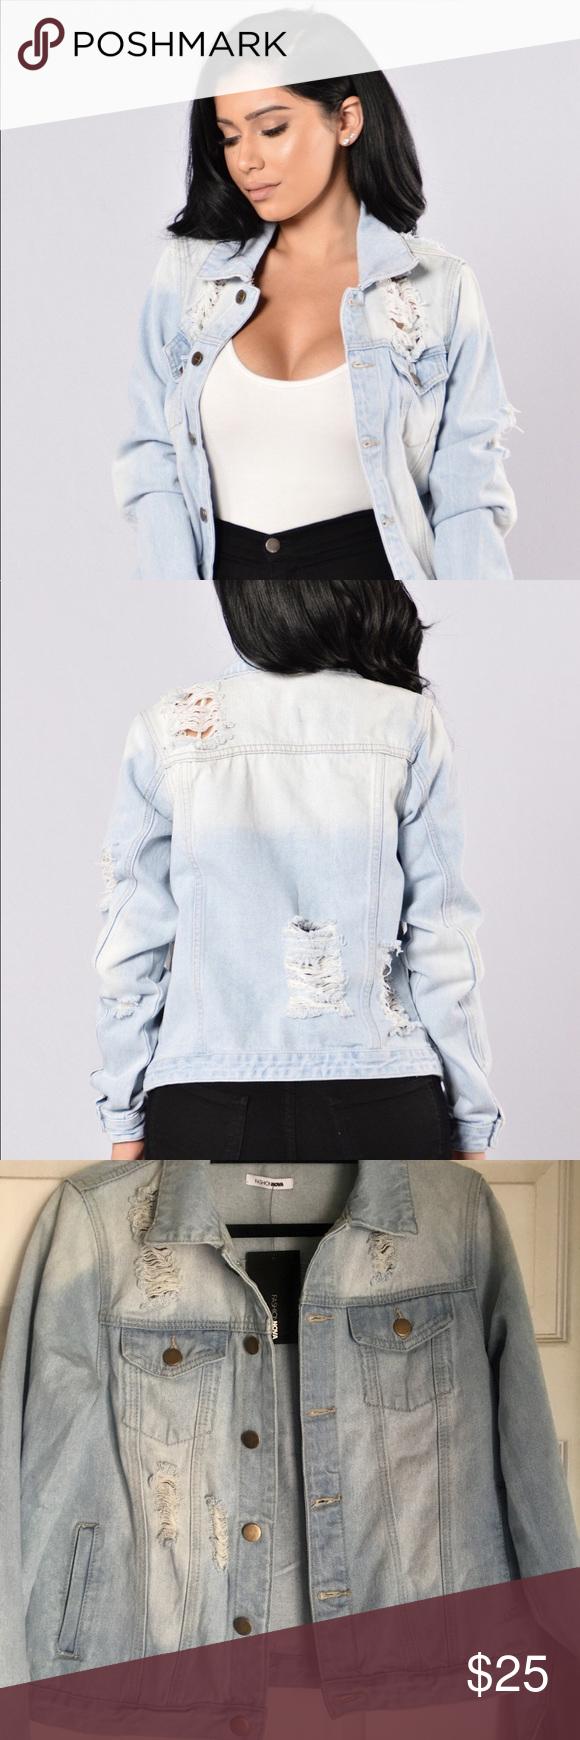 Fwt Fashion Nova Denim Jacket Fashion Fashion Nova Jacket Brands [ 1740 x 580 Pixel ]